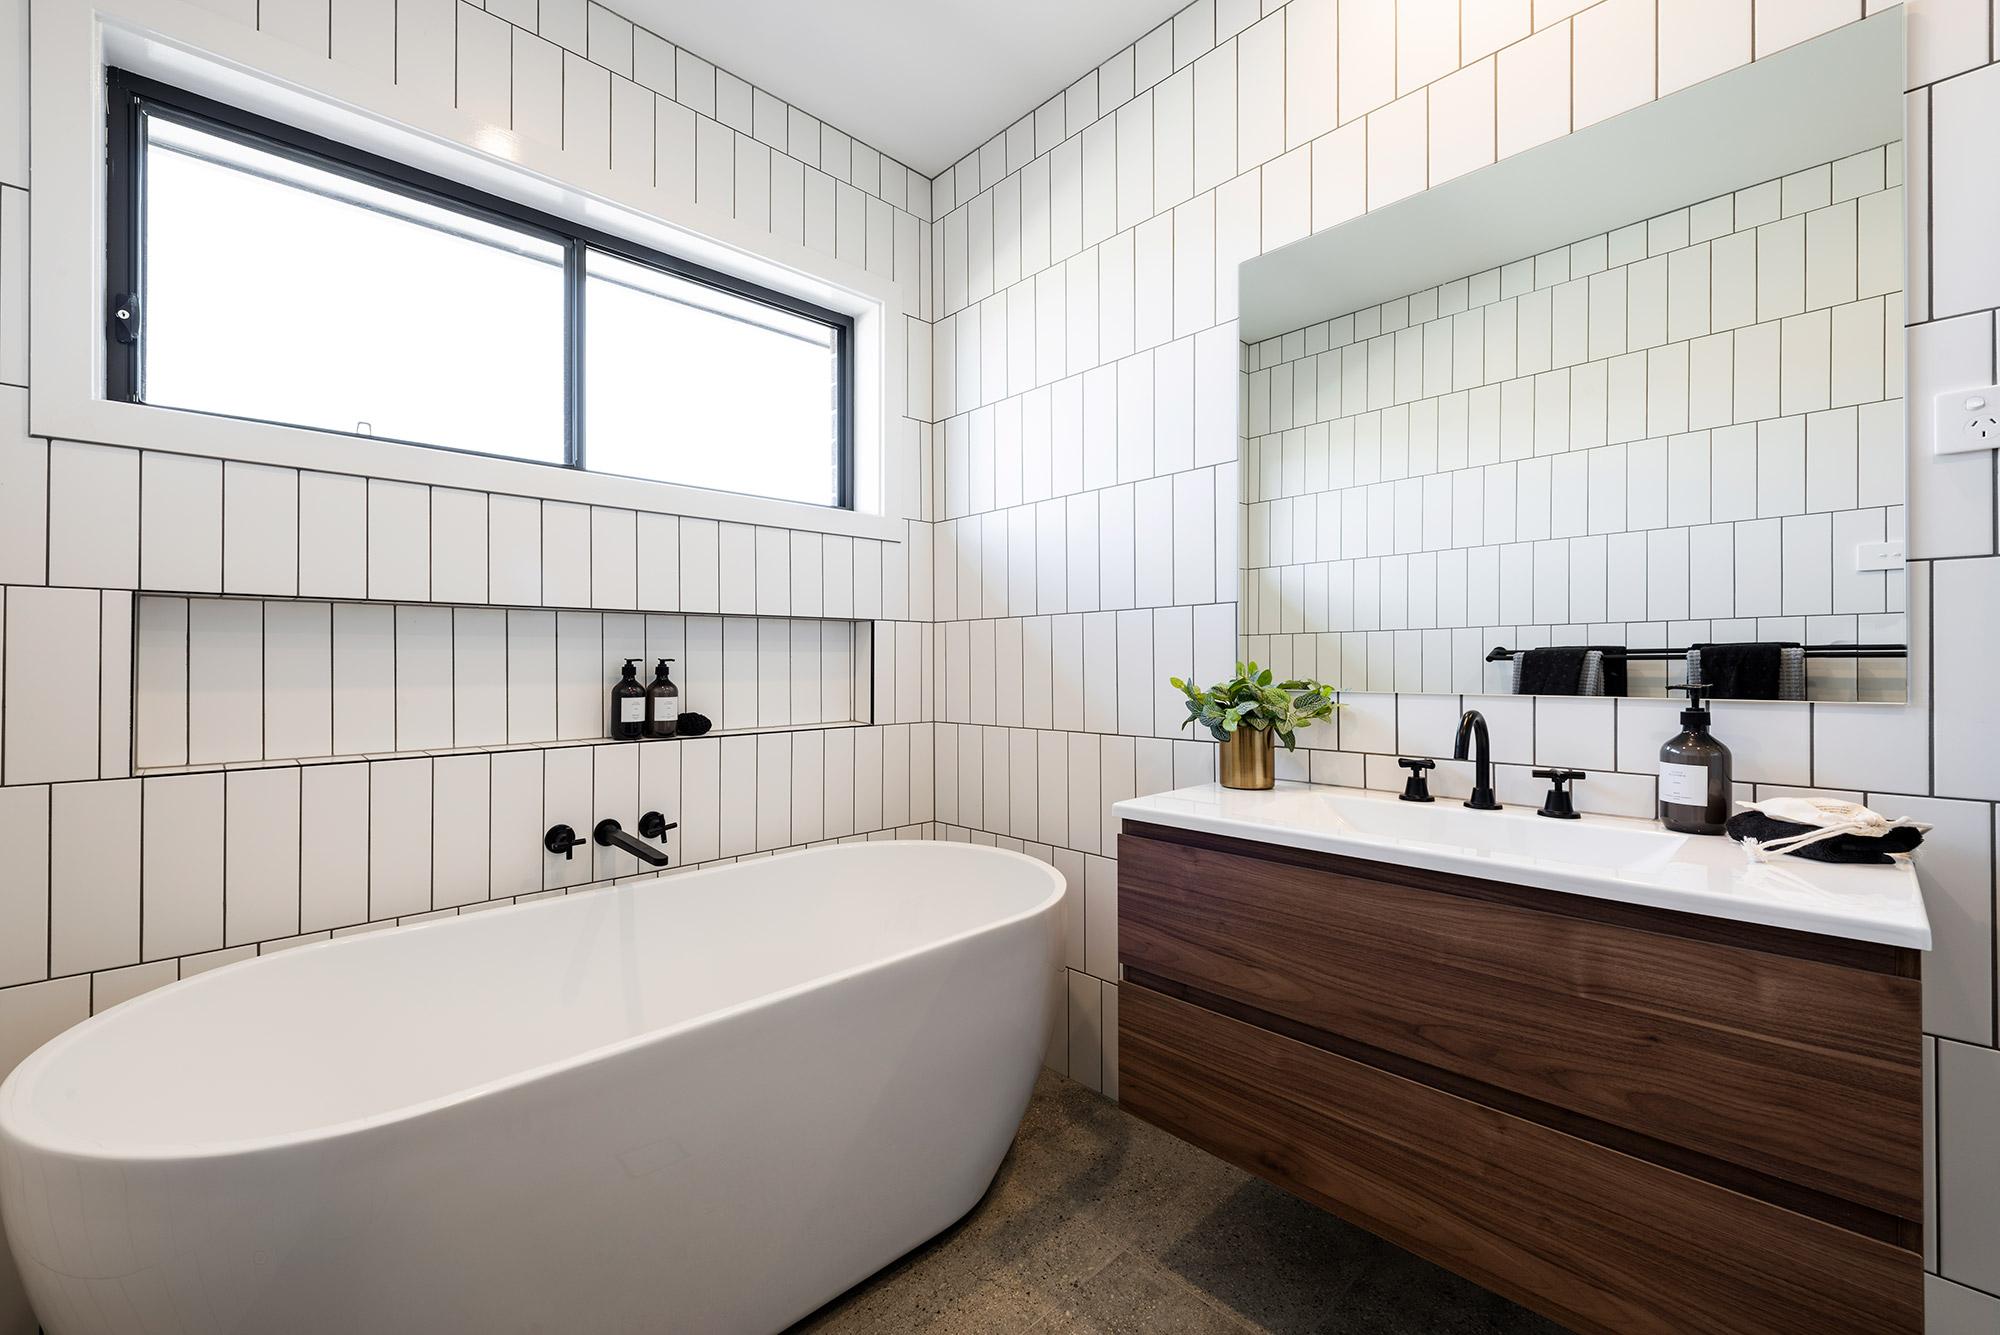 Monaco 1 212 bathroom design